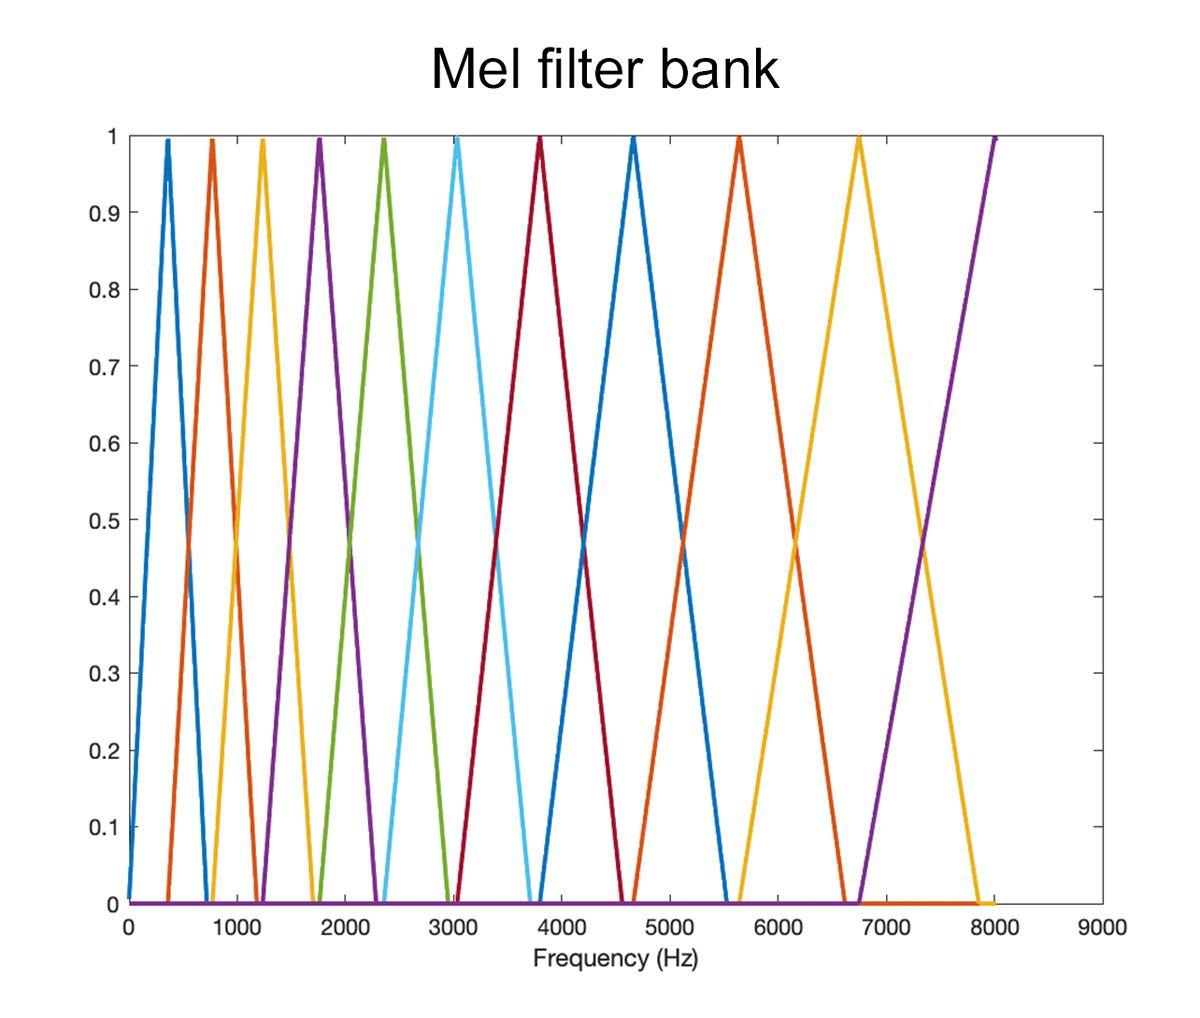 dl-engineers-ebook-ch3-mel-filter-bank